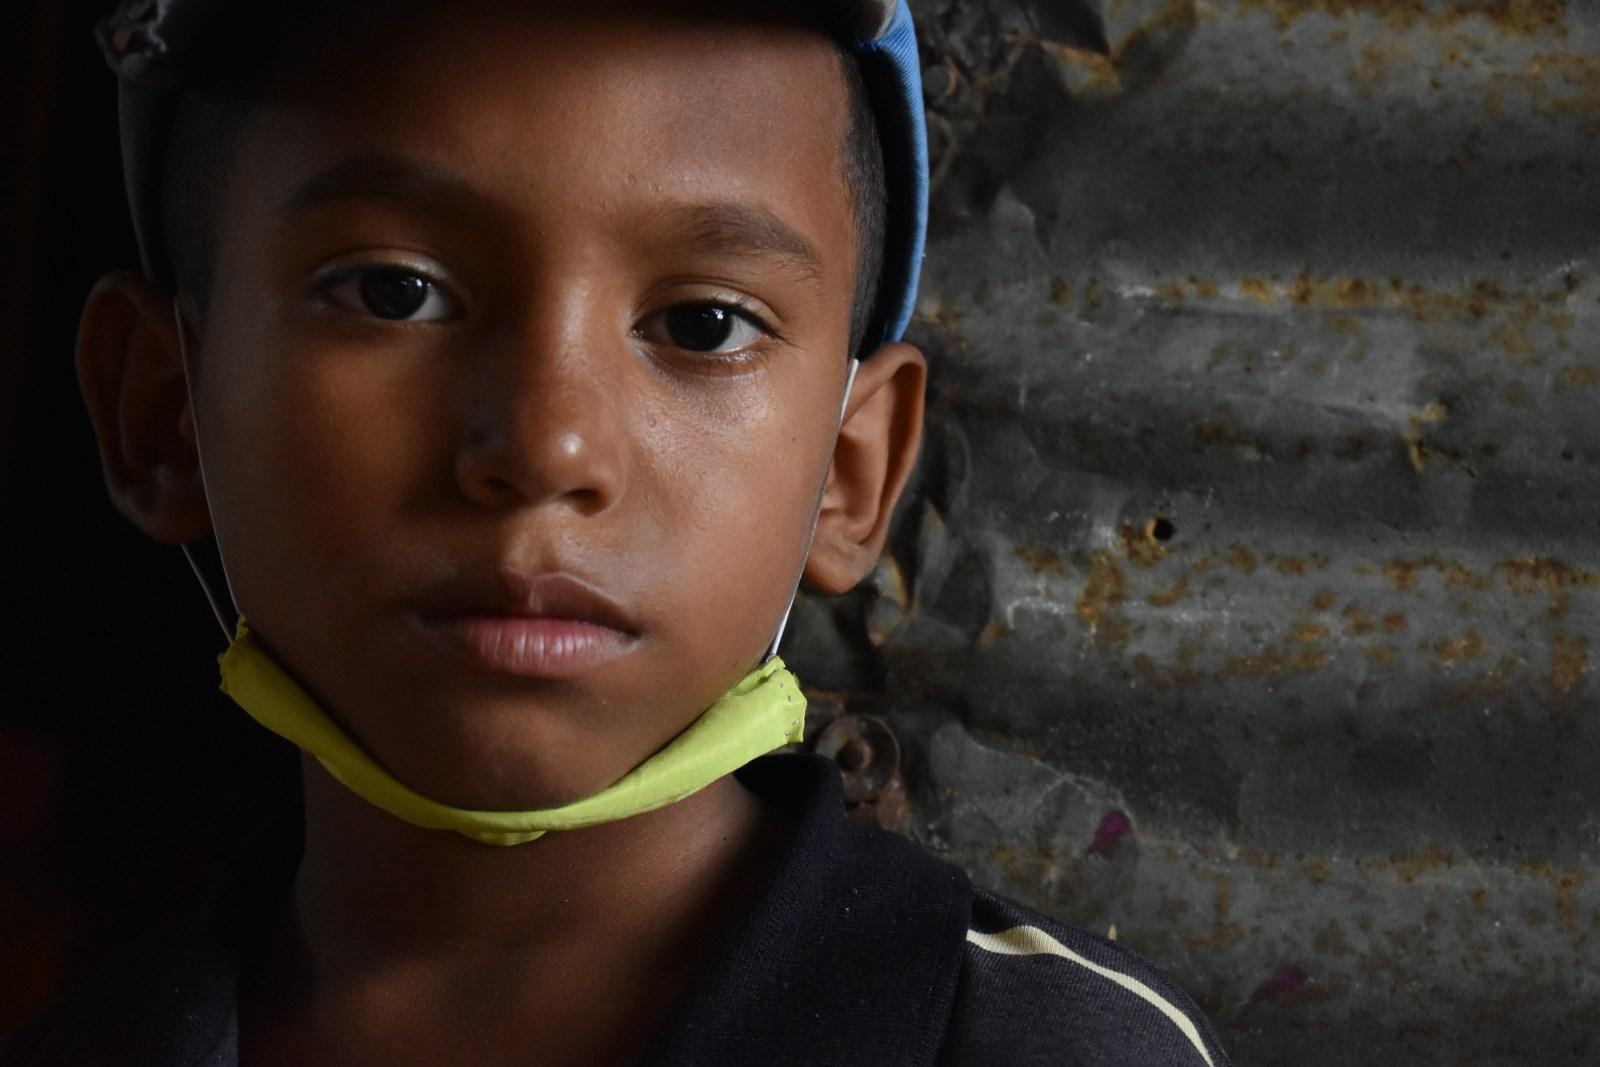 Child in Venezuela